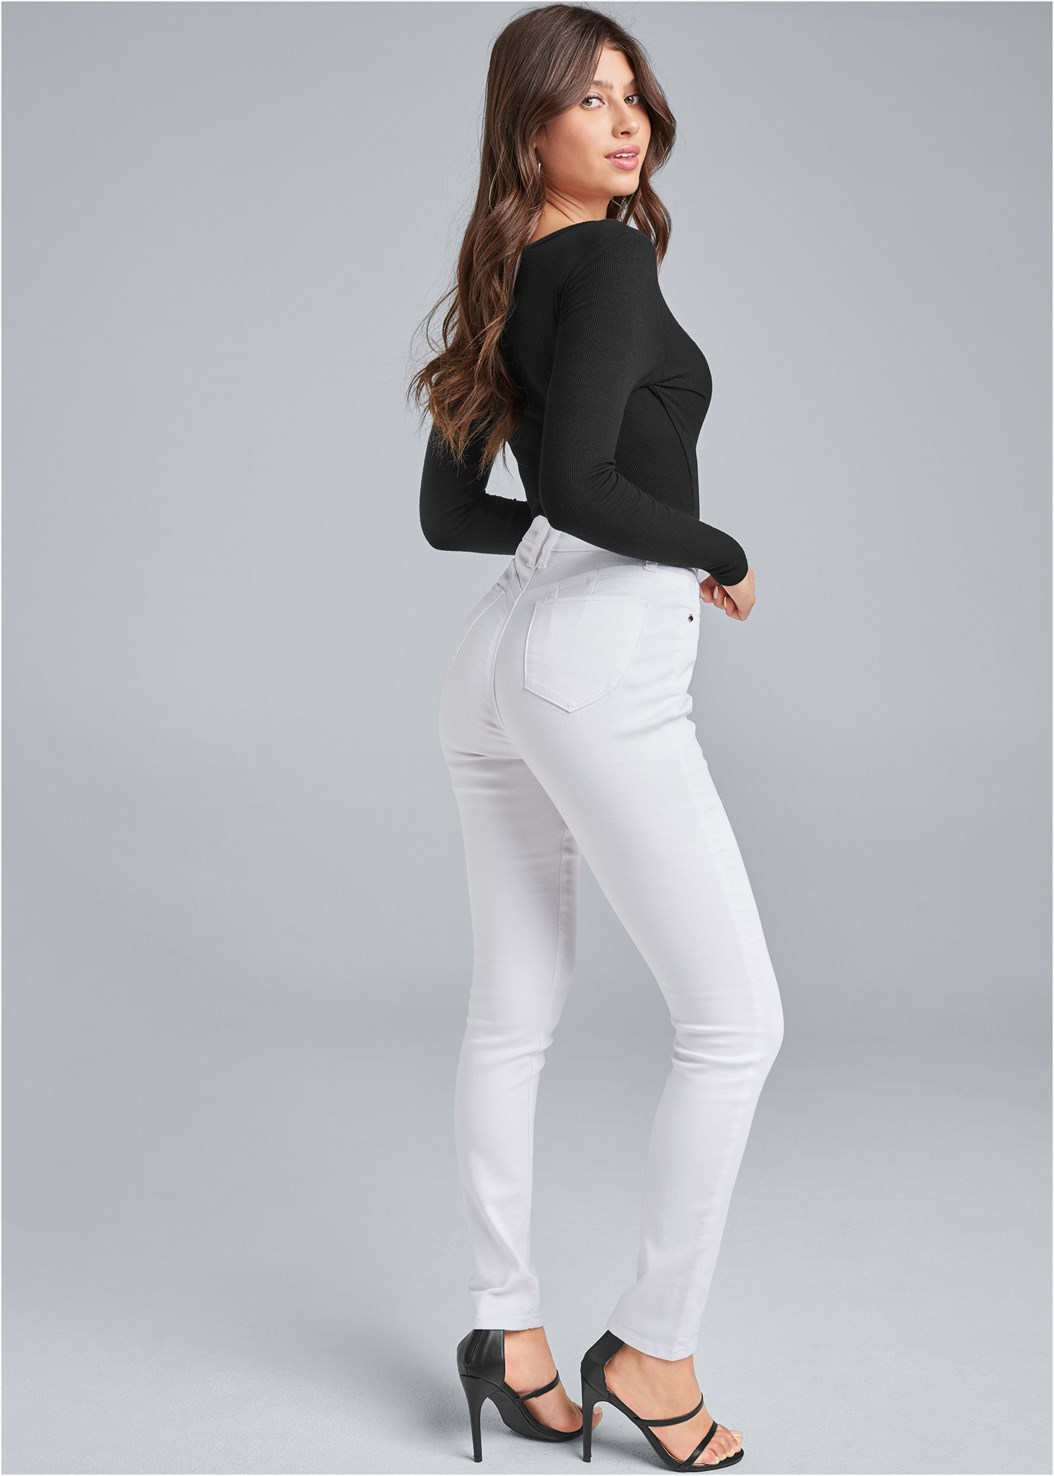 Bum Lifter Jeans,Ribbed V-Neck Top,Button Up Bodysuit,High Heel Strappy Sandals,Pearl Detail Bracelet Set,Print Detail Handbag